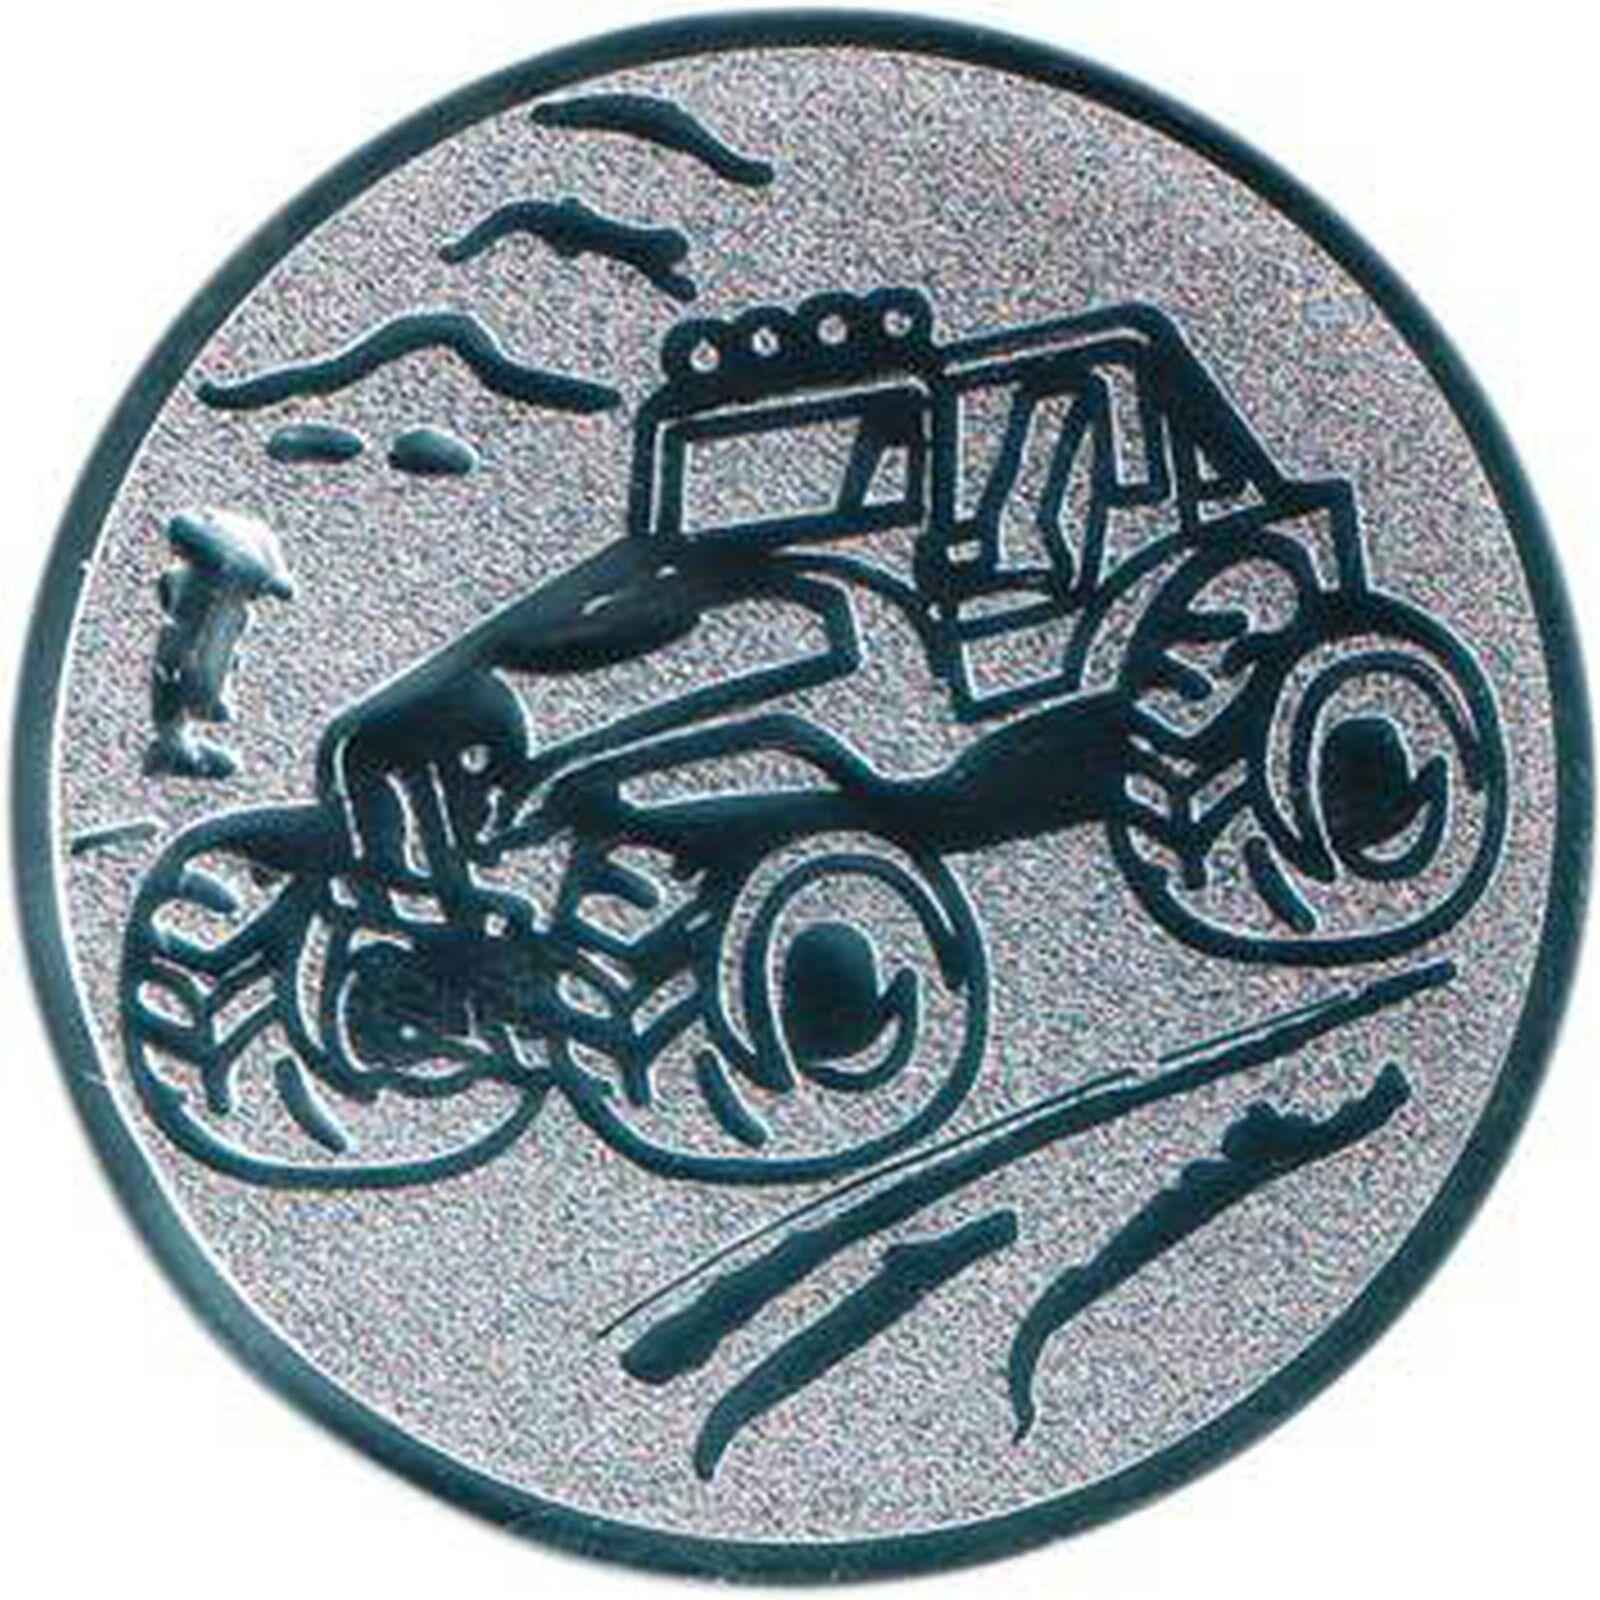 100 Embleme D D D 50mm Motorsport Jeep (Rally für Medaillen Pokale Pokal Emblem) 0d9cff